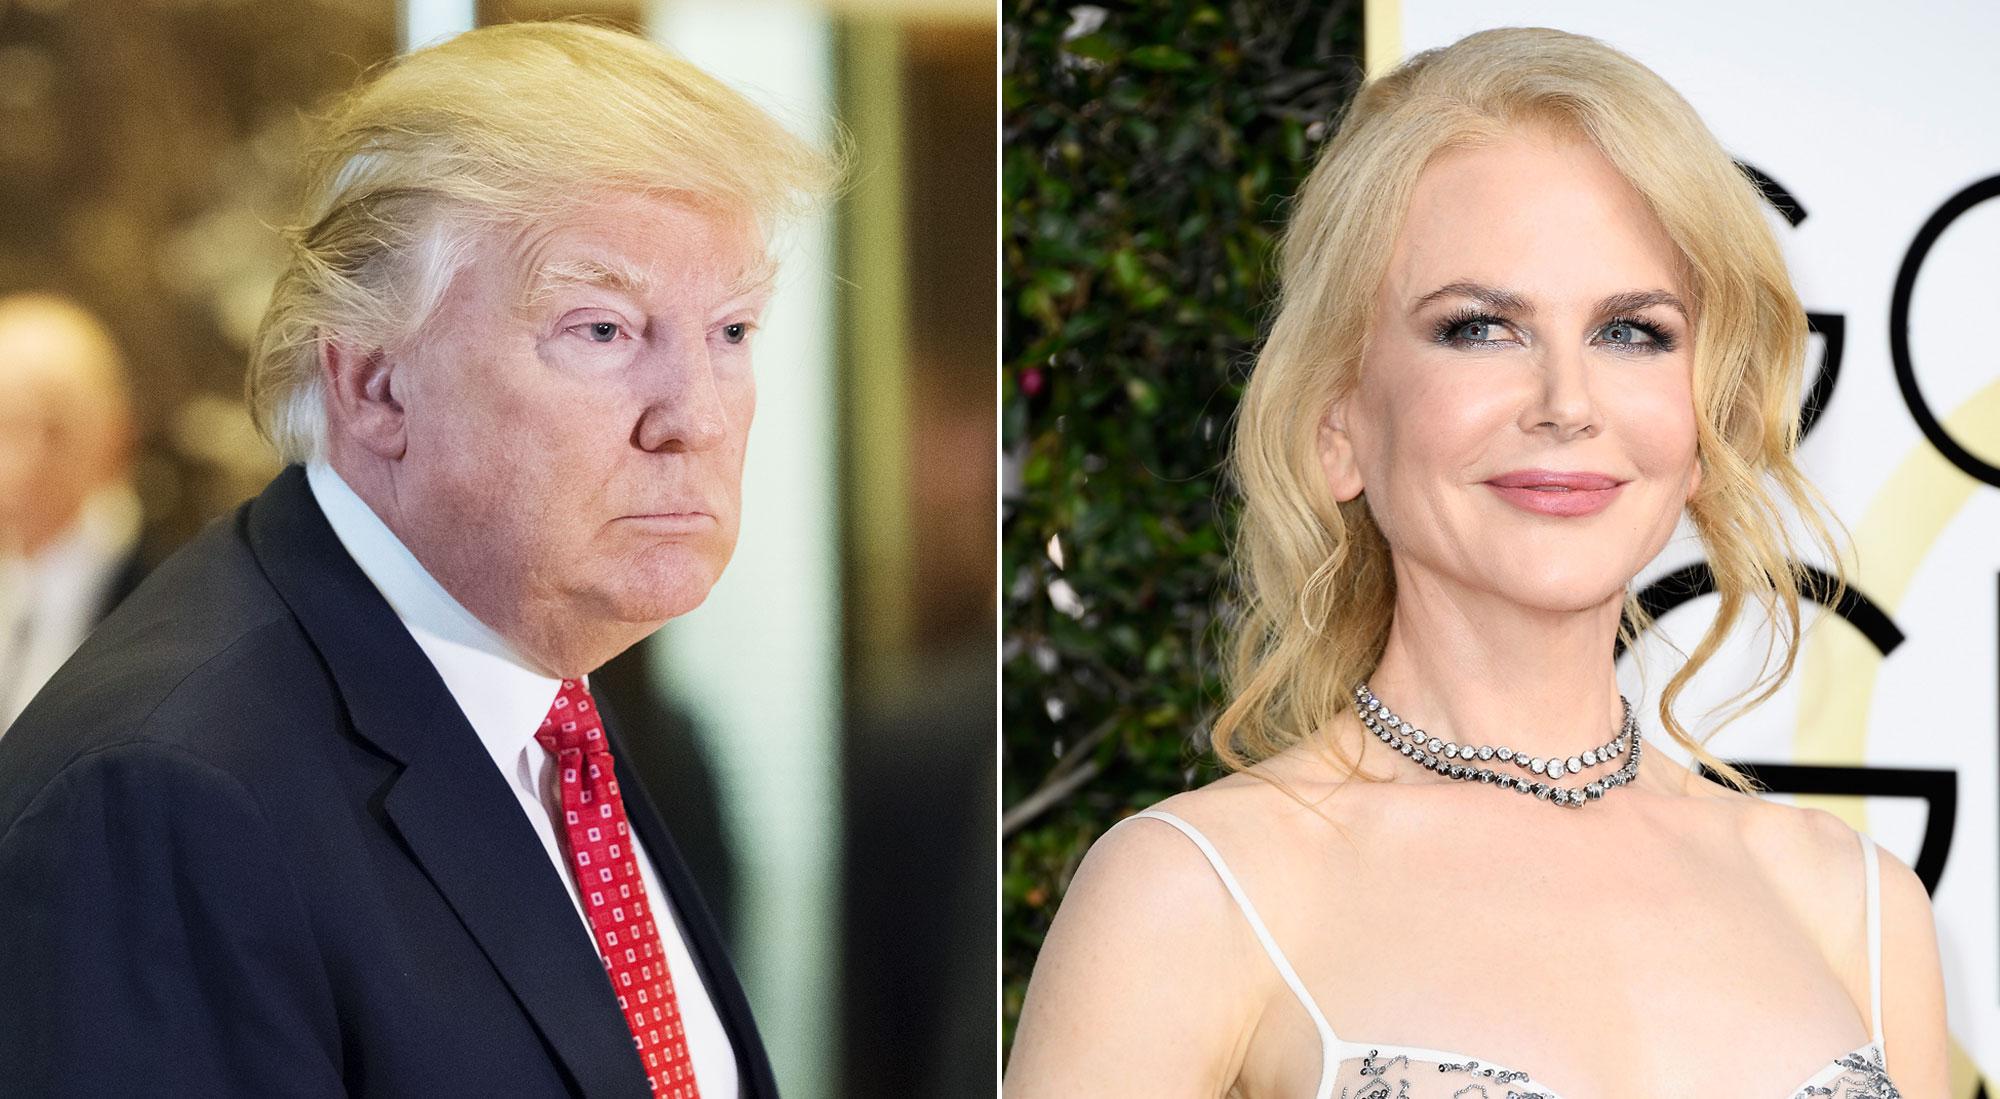 Donald Trump Nicole Kidman